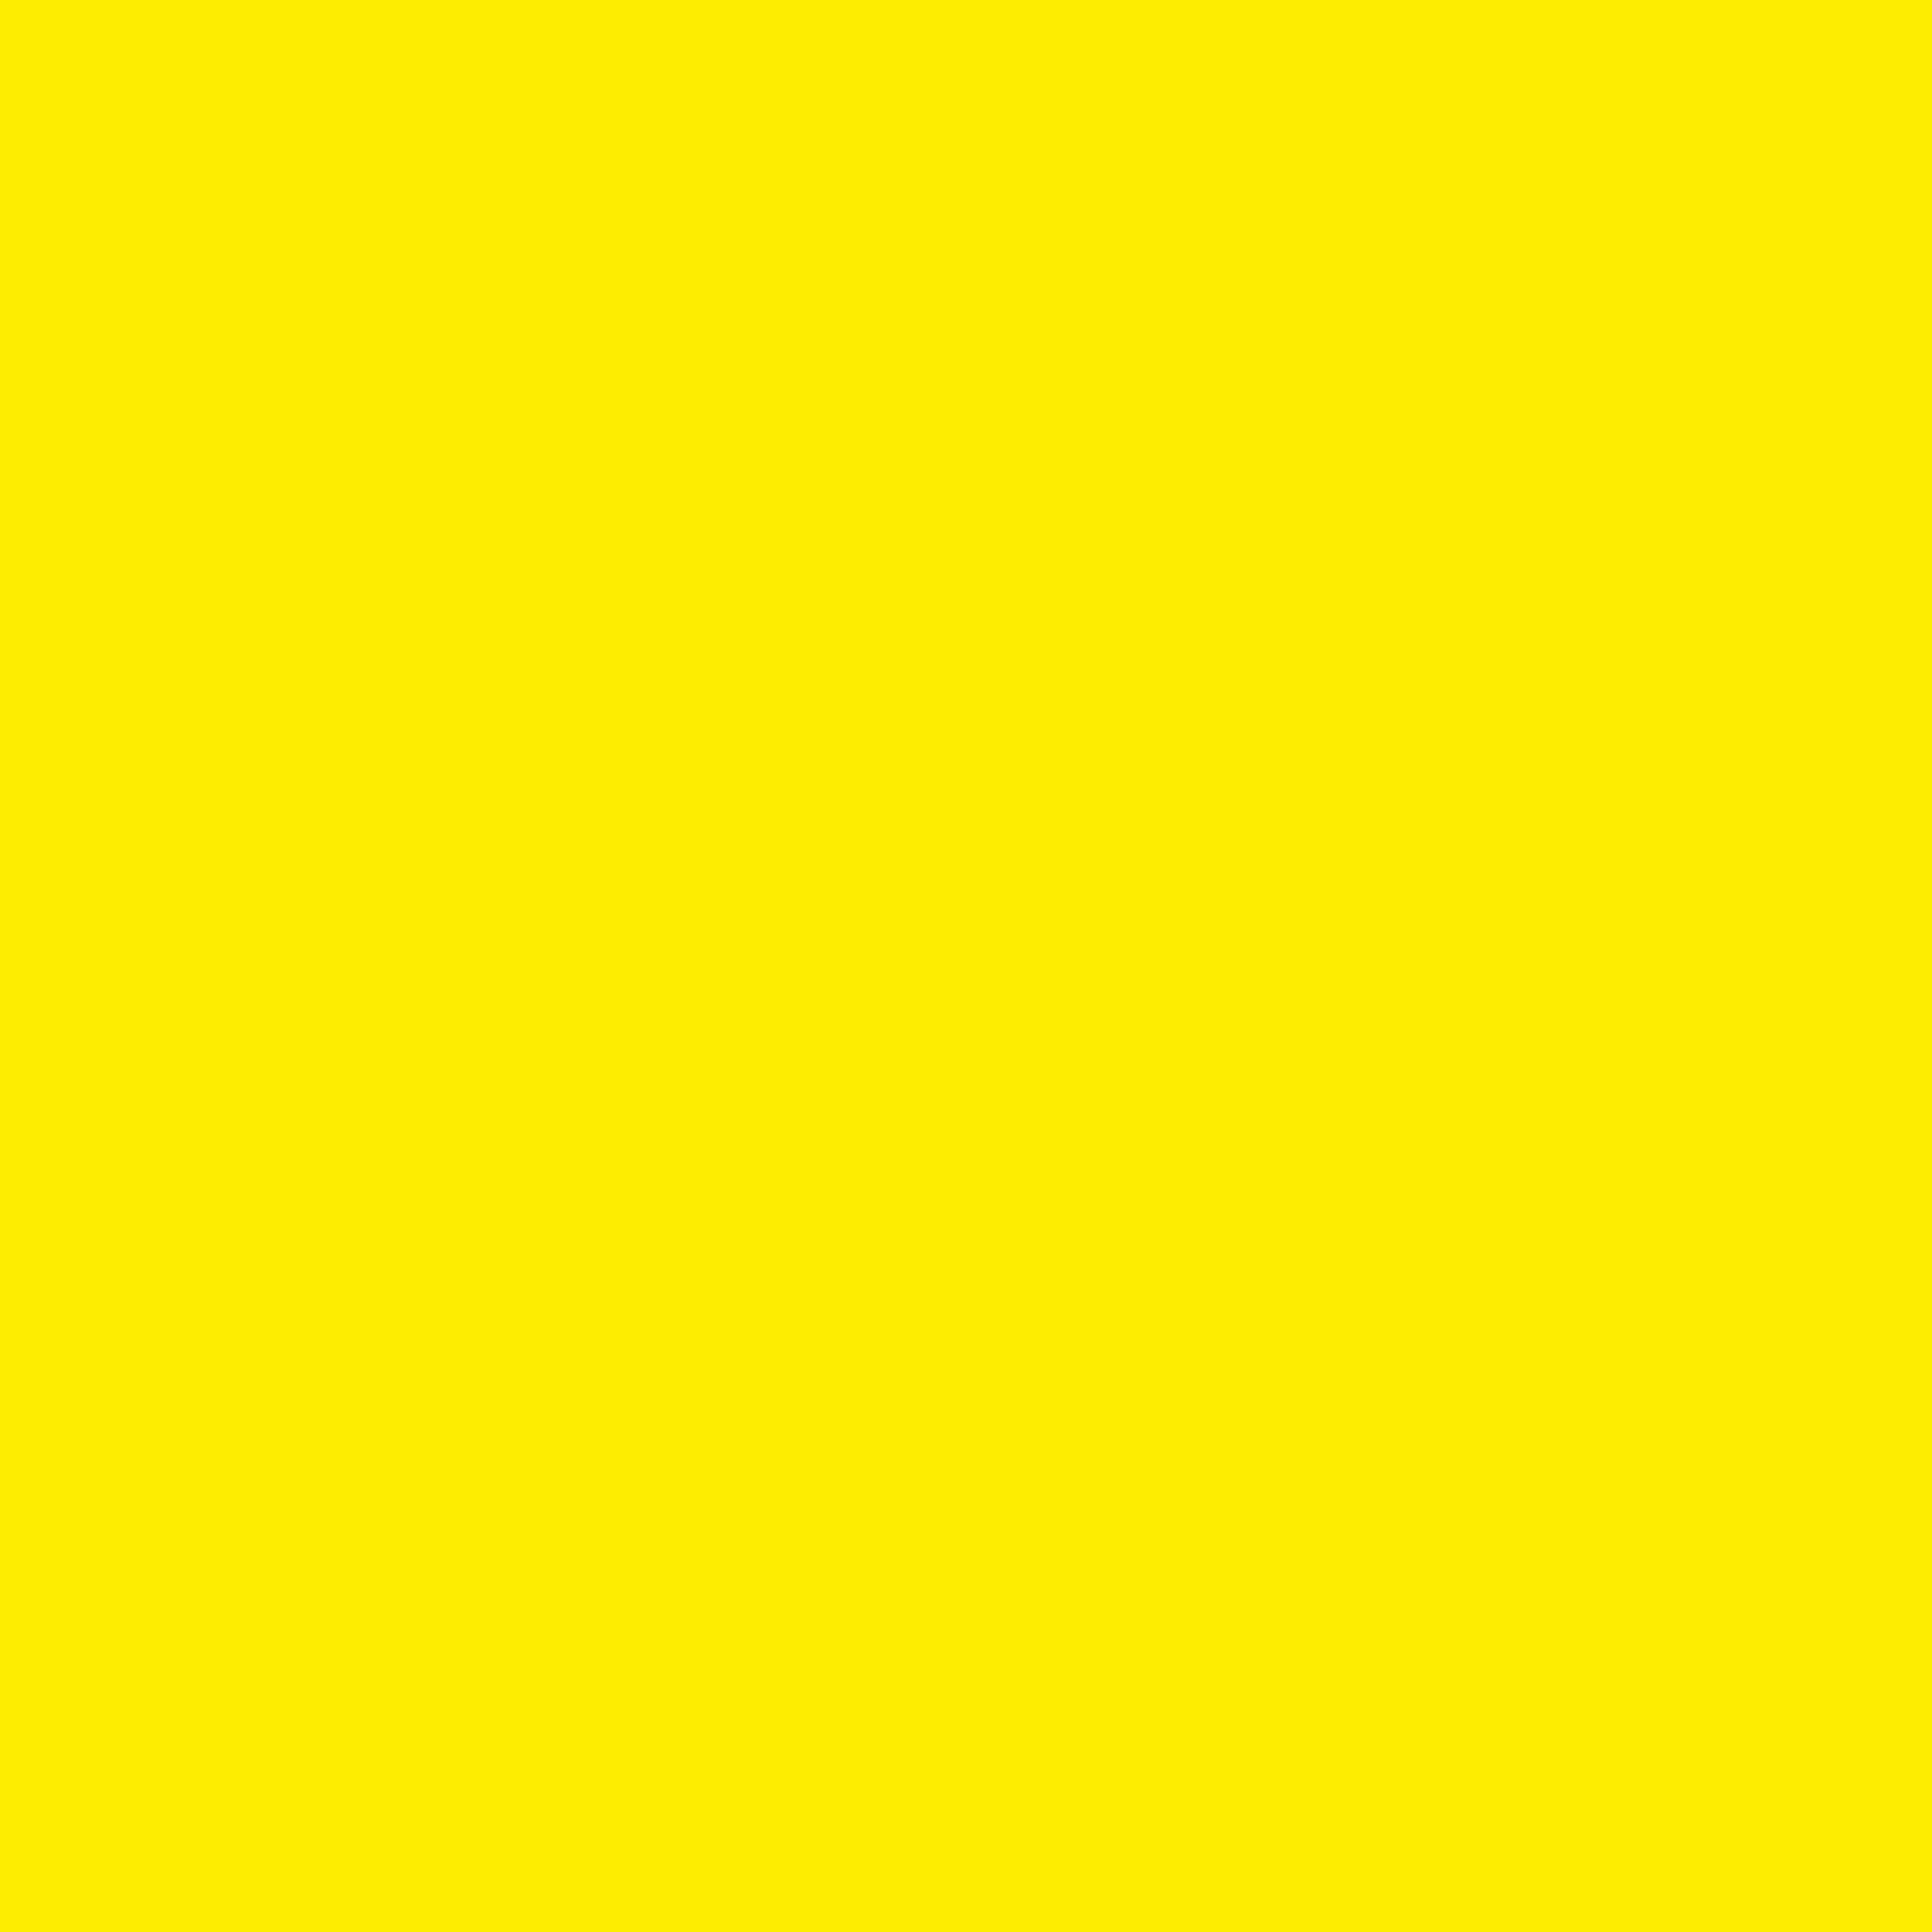 3600x3600 Aureolin Solid Color Background